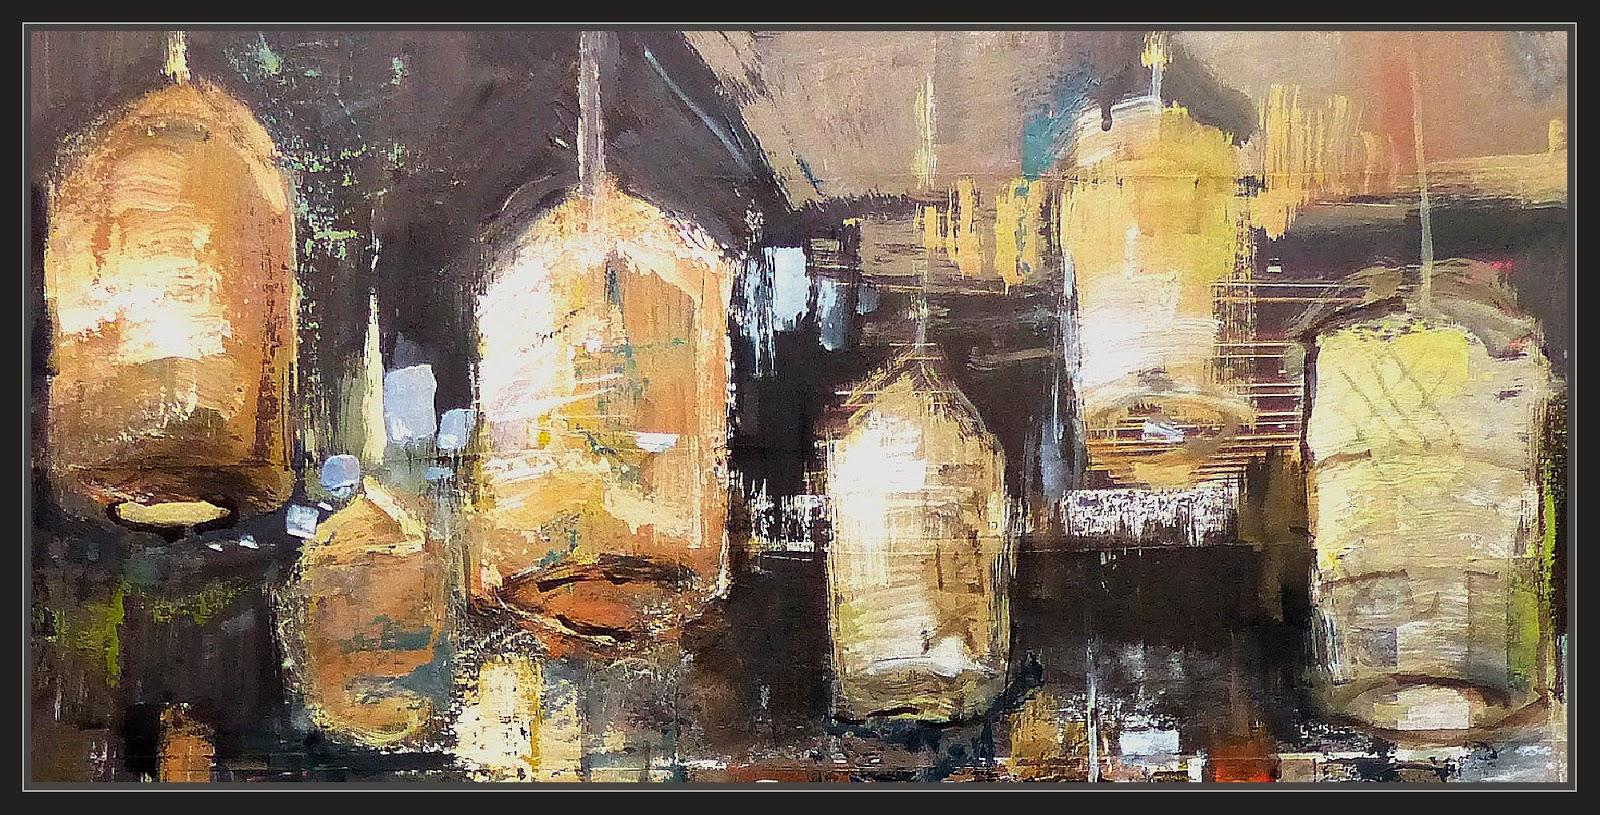 Ernest descals artista pintor restaurante chino pintura for Restaurante chino jardin